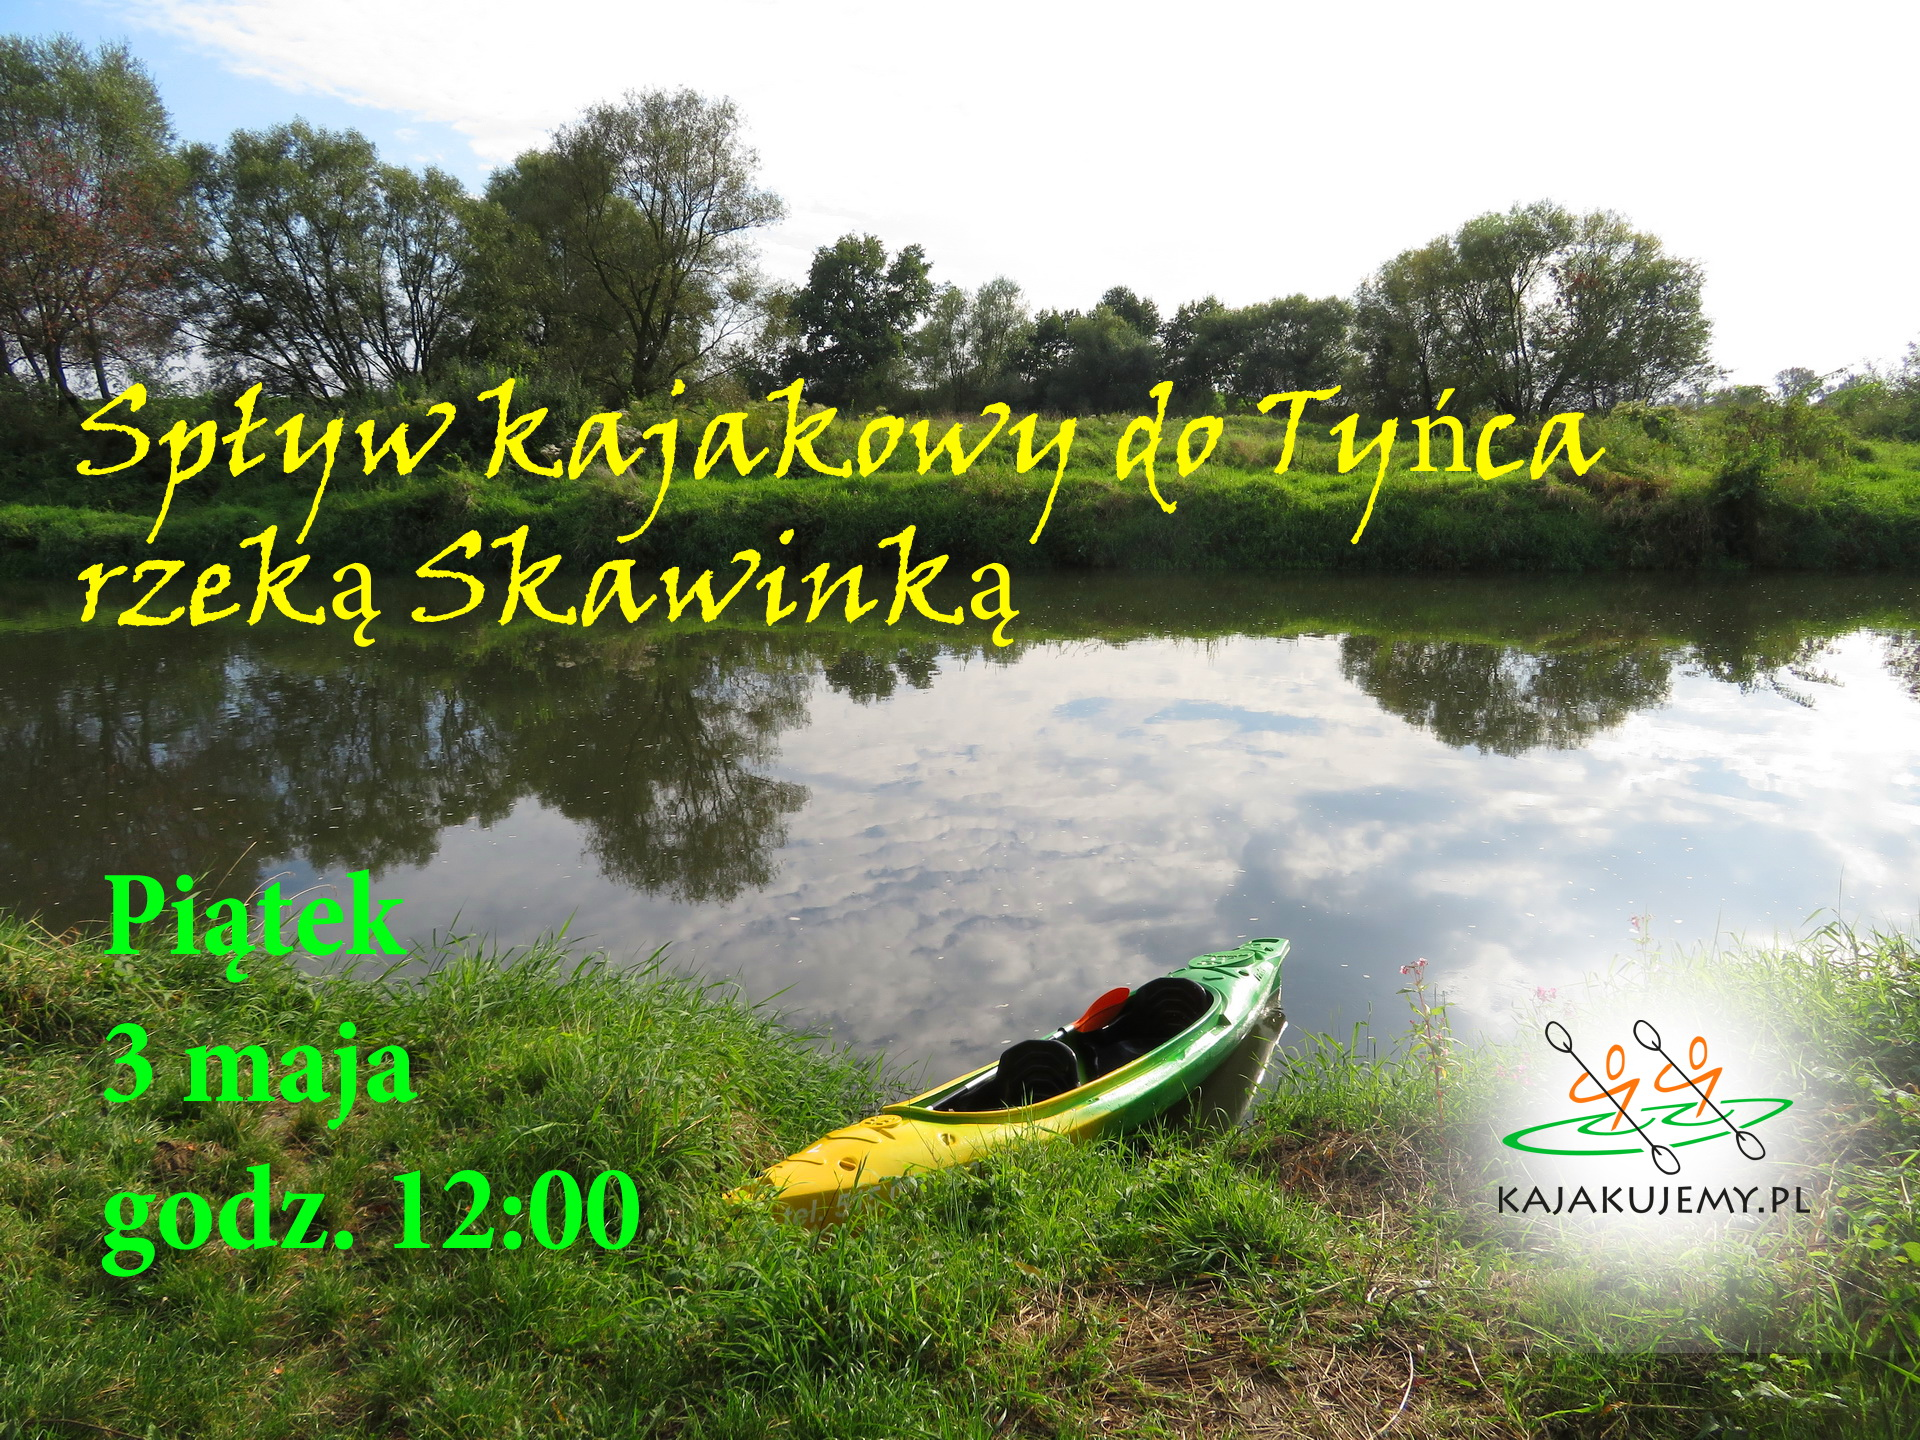 Weekend majowy w Krakowie